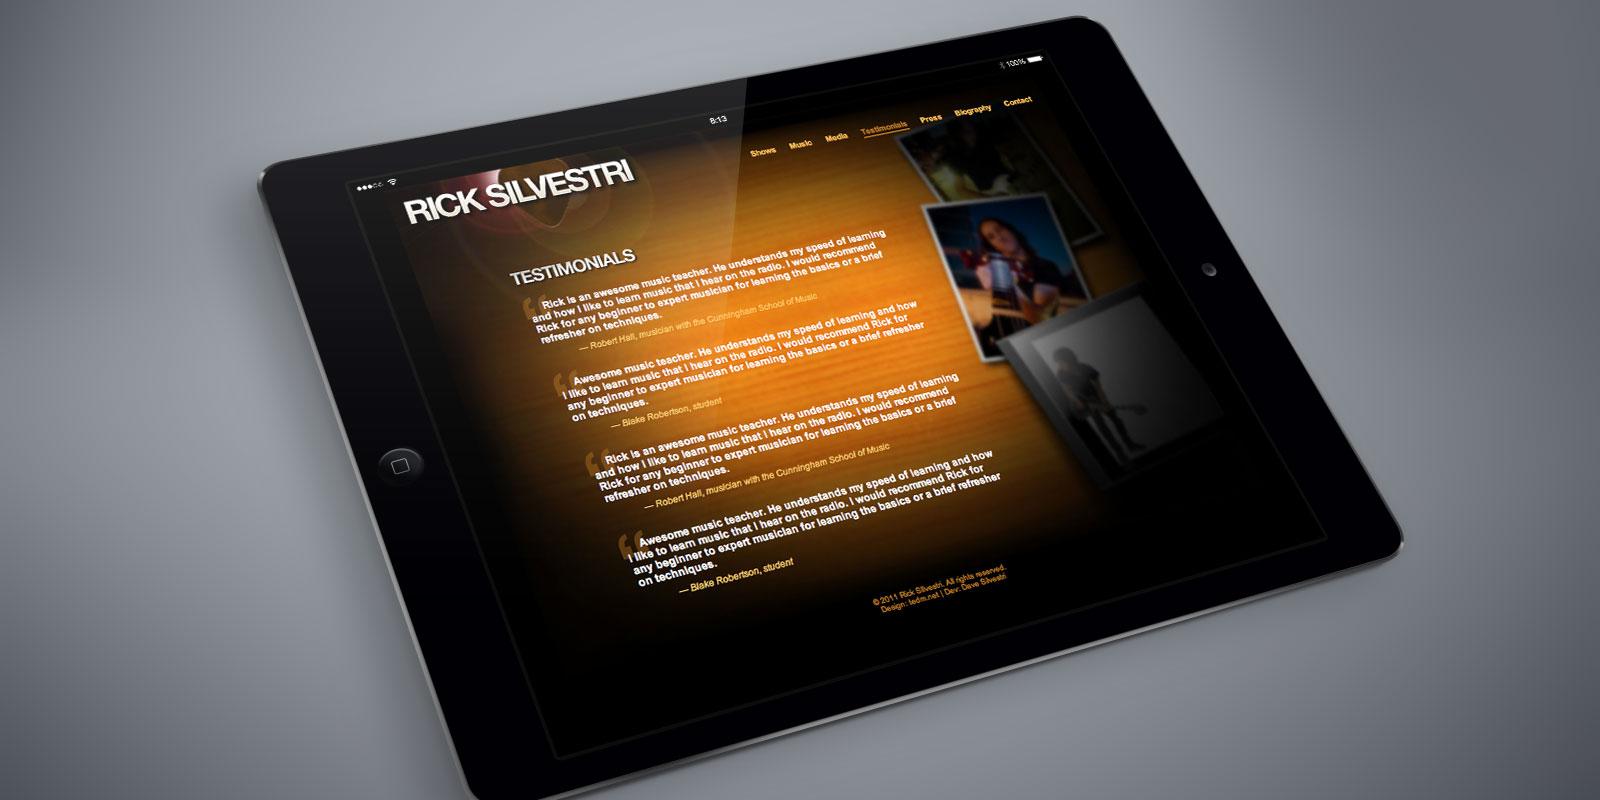 Rick Silvestri website on a tablet